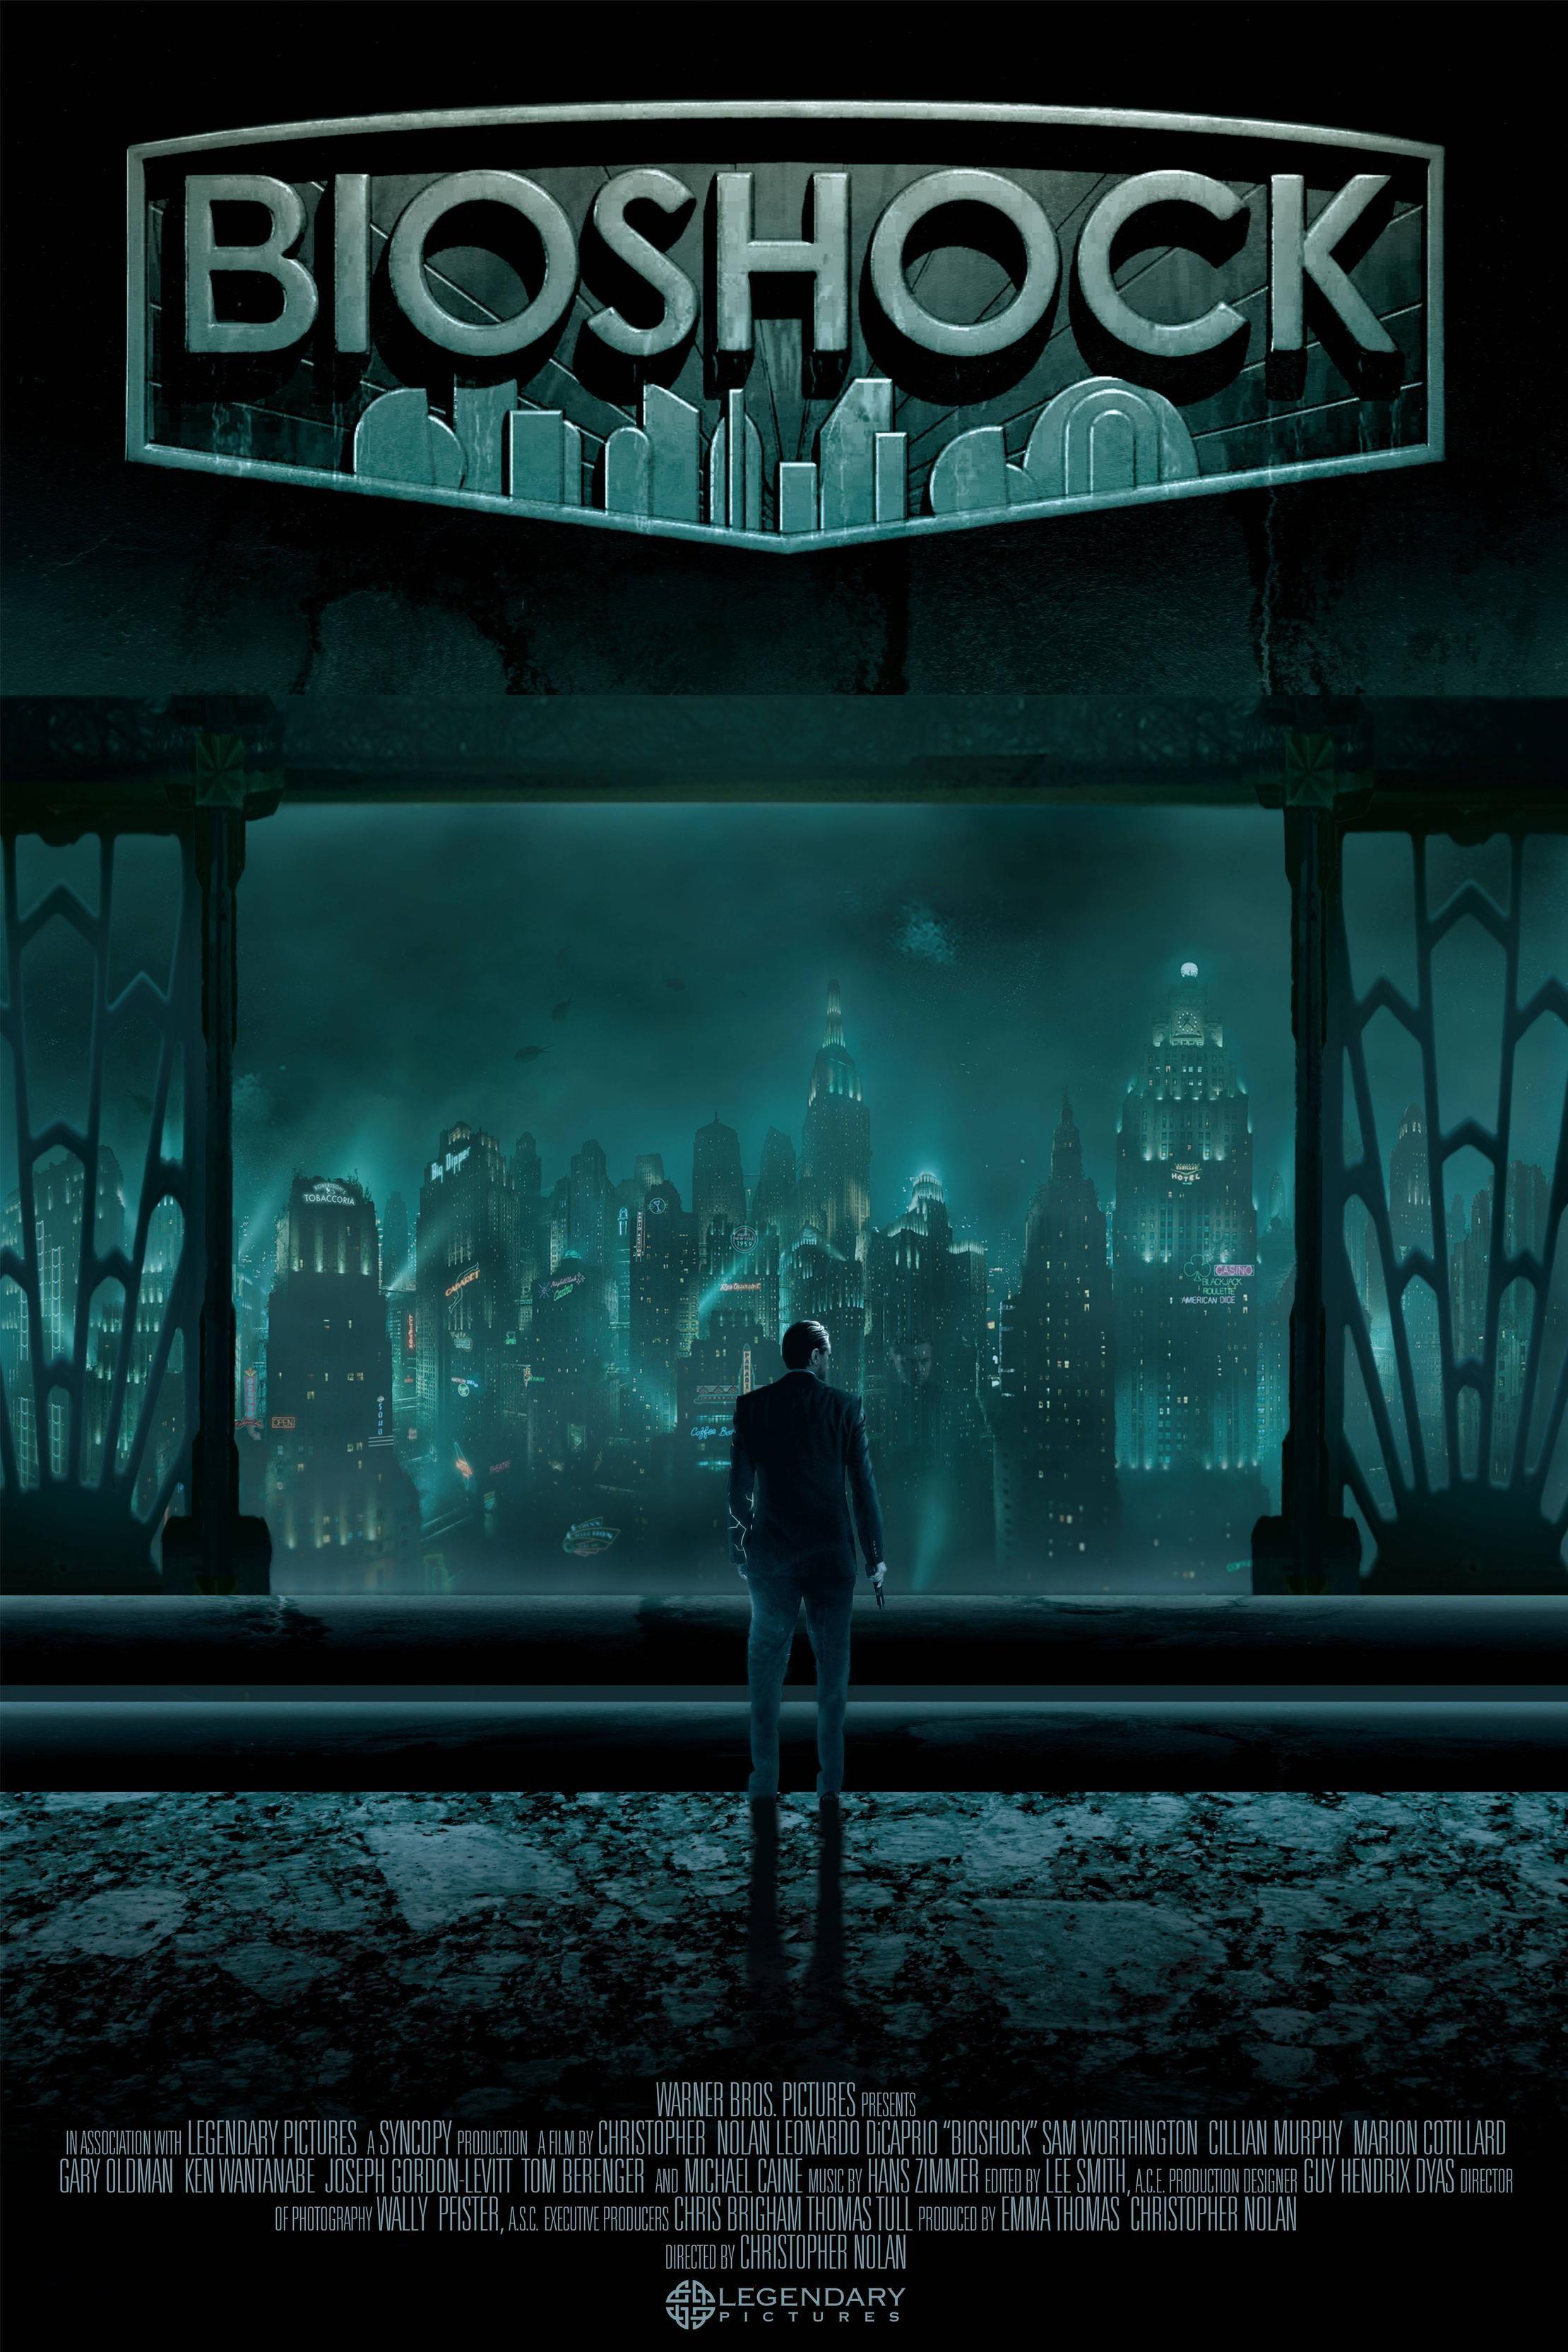 Bioshock Movie Poster | Video Games | Bioshock game